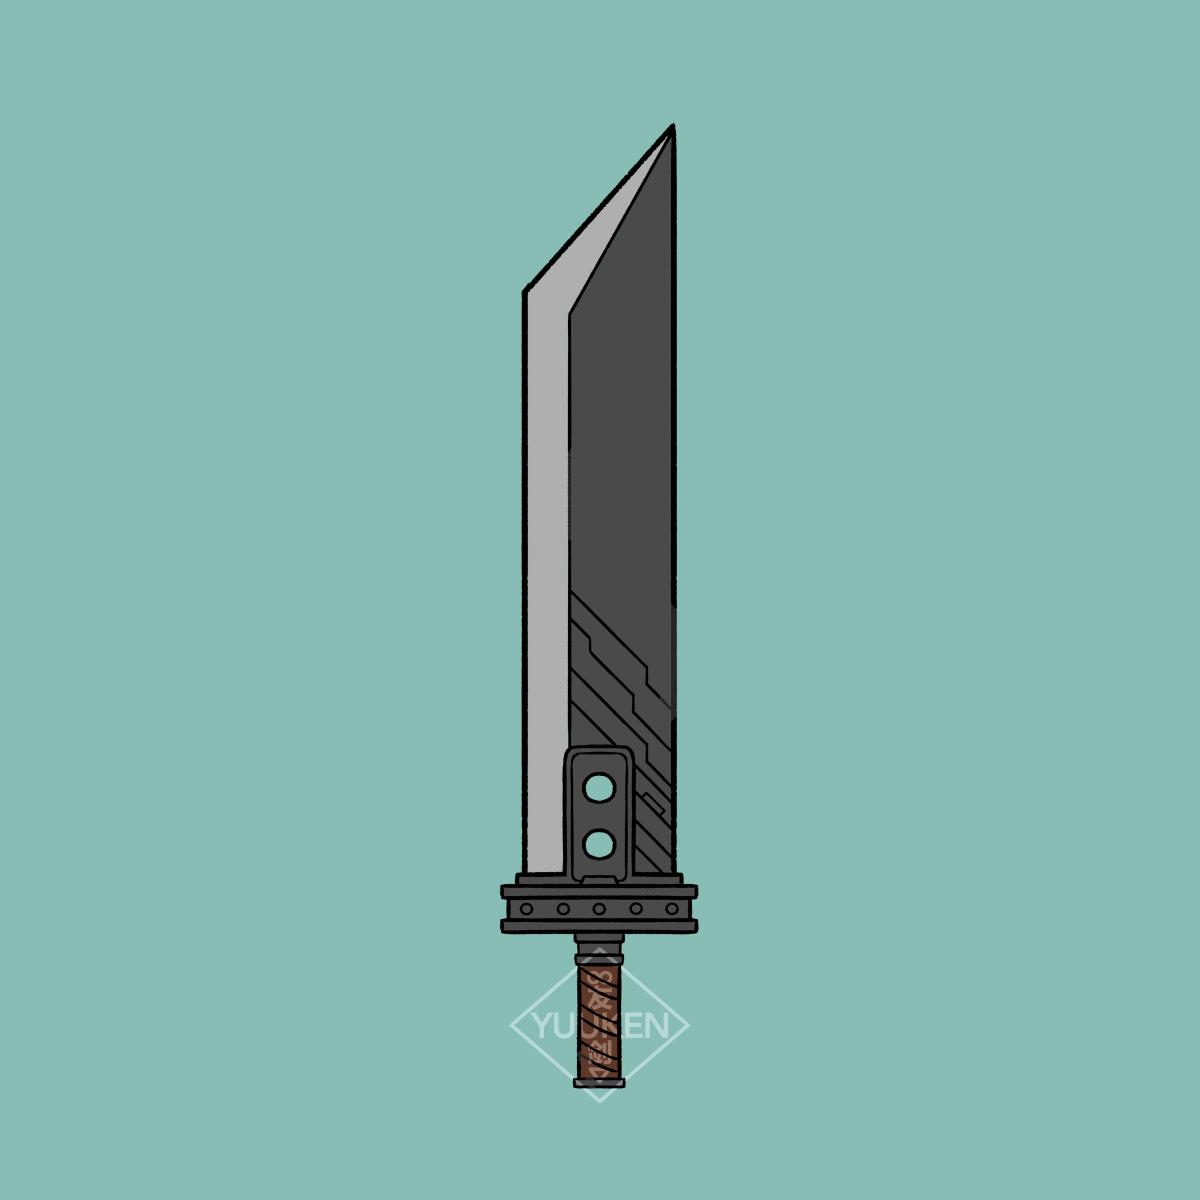 Pin By Tyler Kuber On Tattoos Final Fantasy Gaming Tattoo Fantasy Sword